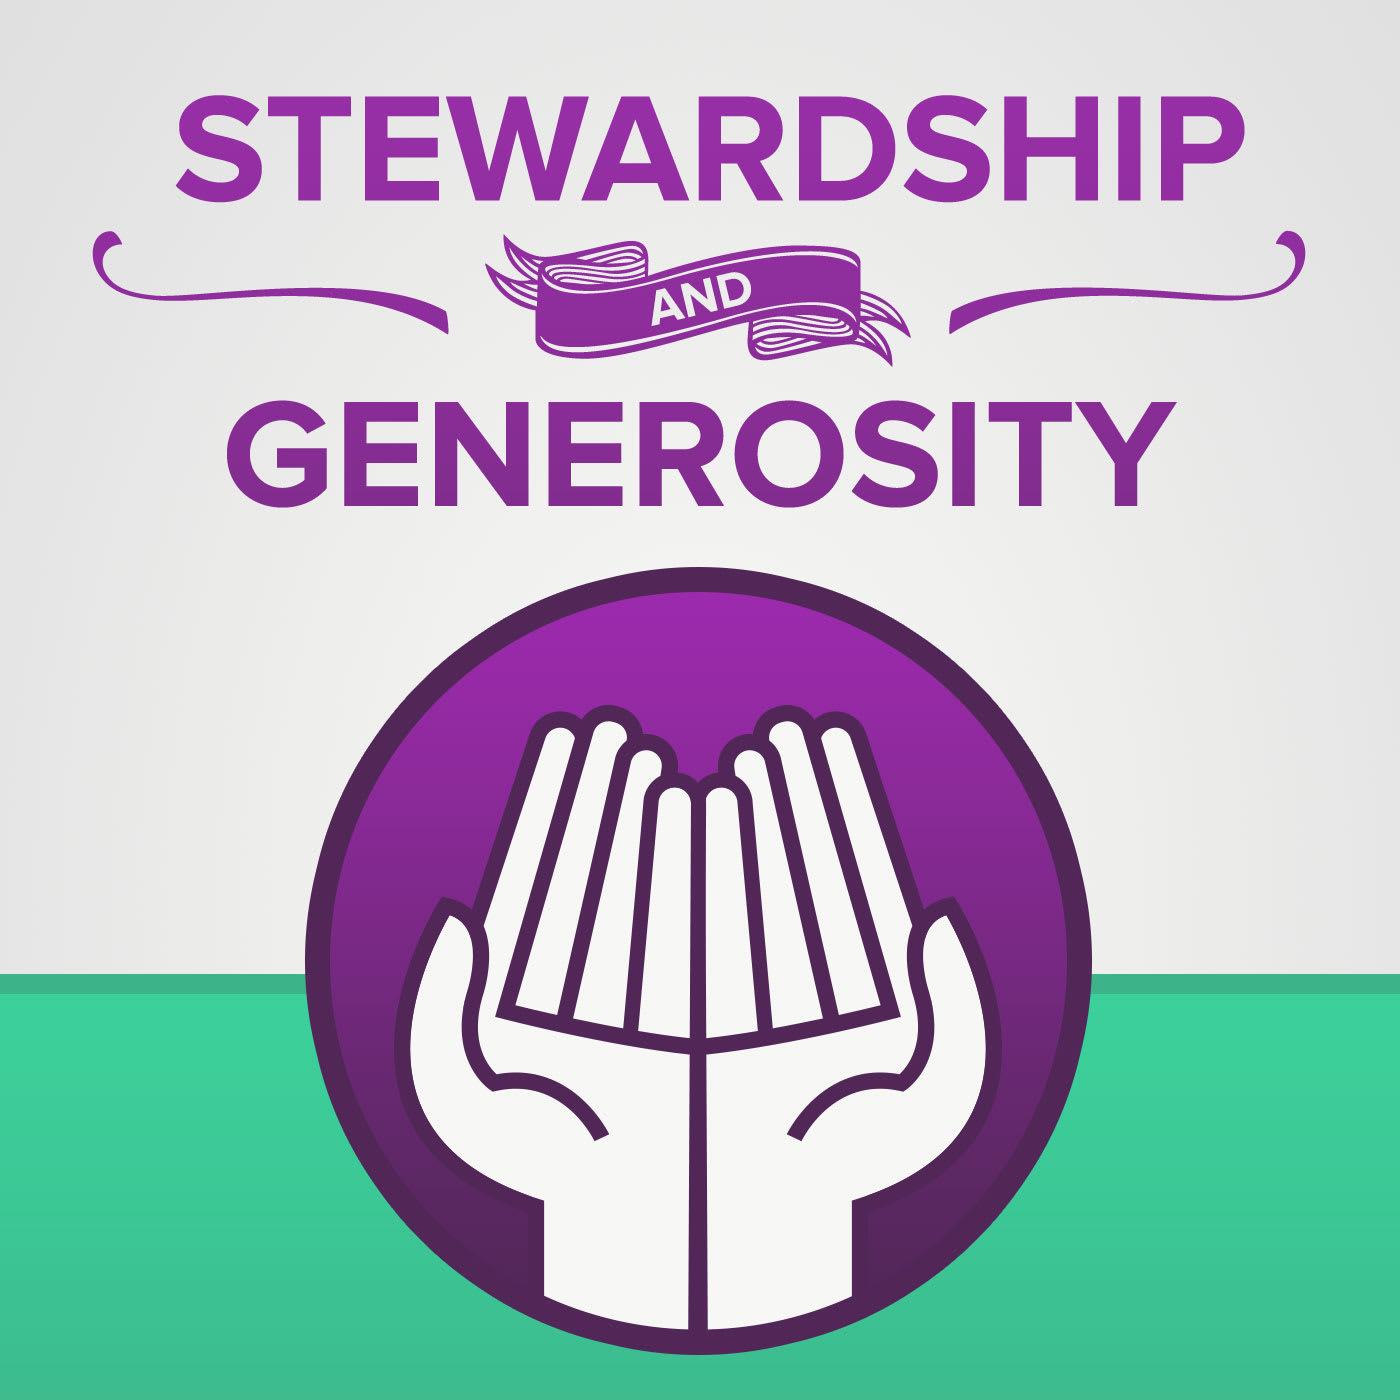 Stewardship & Generosity